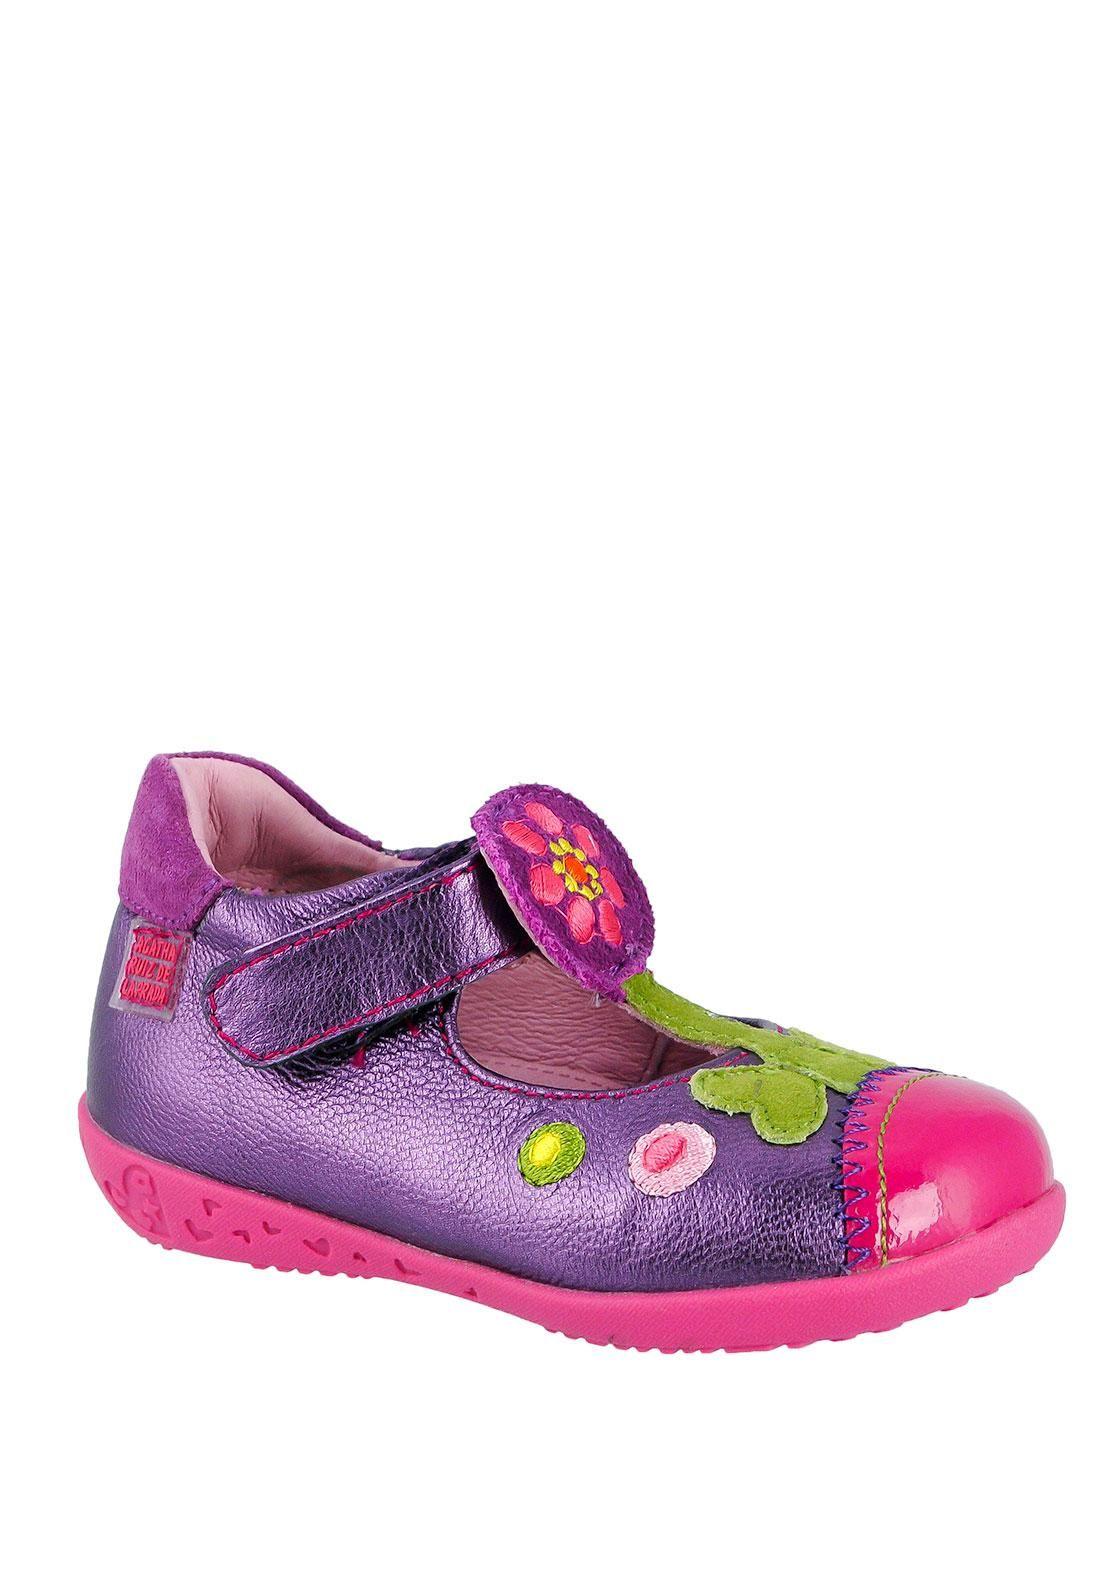 Agatha Ruiz de la Prada Flower Shoe, Purple | McElhinneys Online Department Store